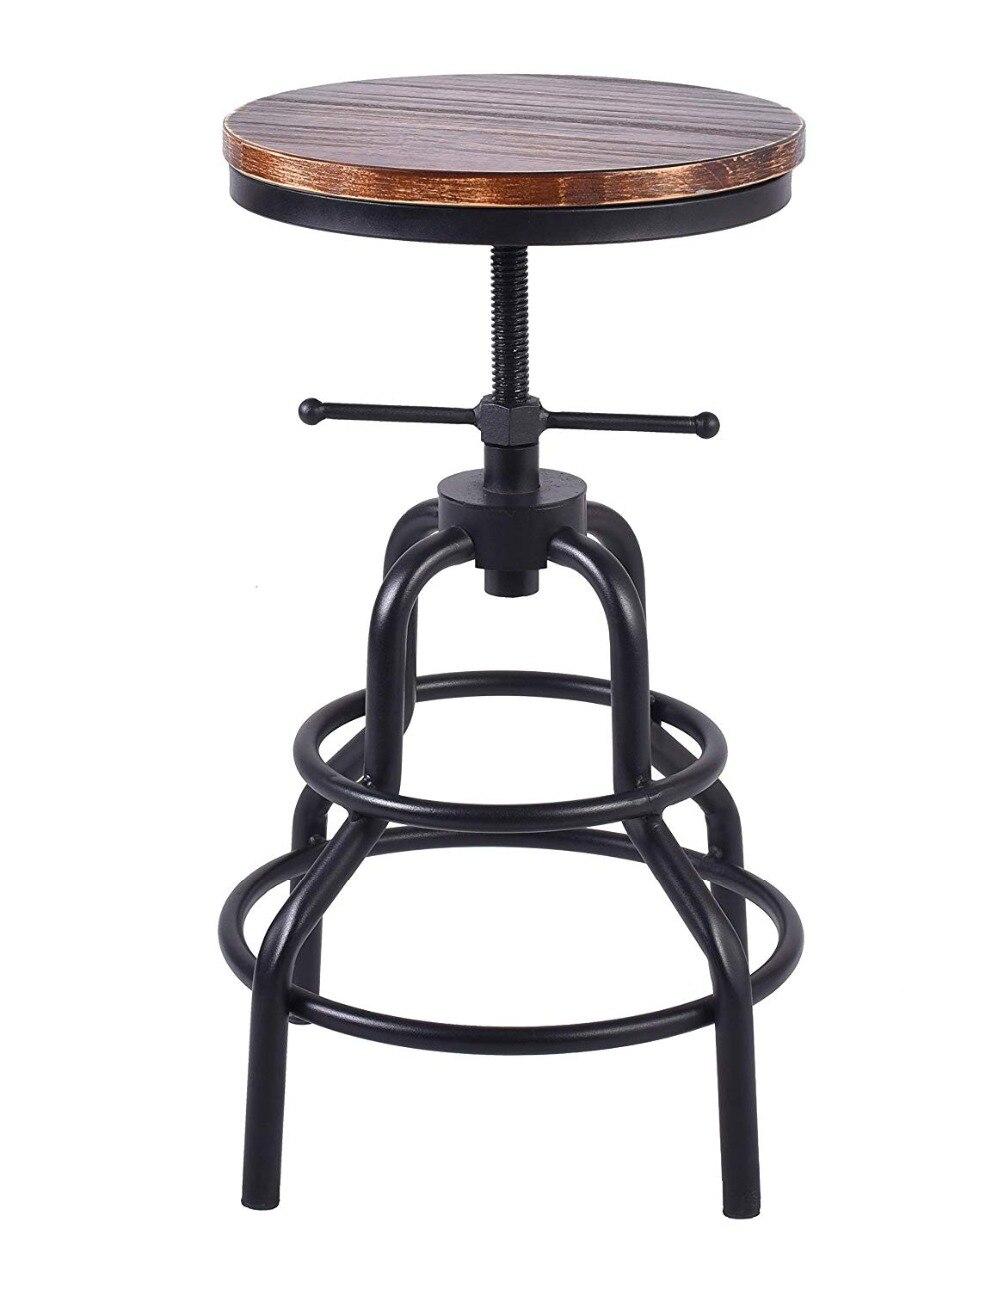 Topower Industrial Retro Pinewood Metal Bar Stool Adjustable Height Swivel Pub Kitchen Round Pinewood Swivel Bar Stool